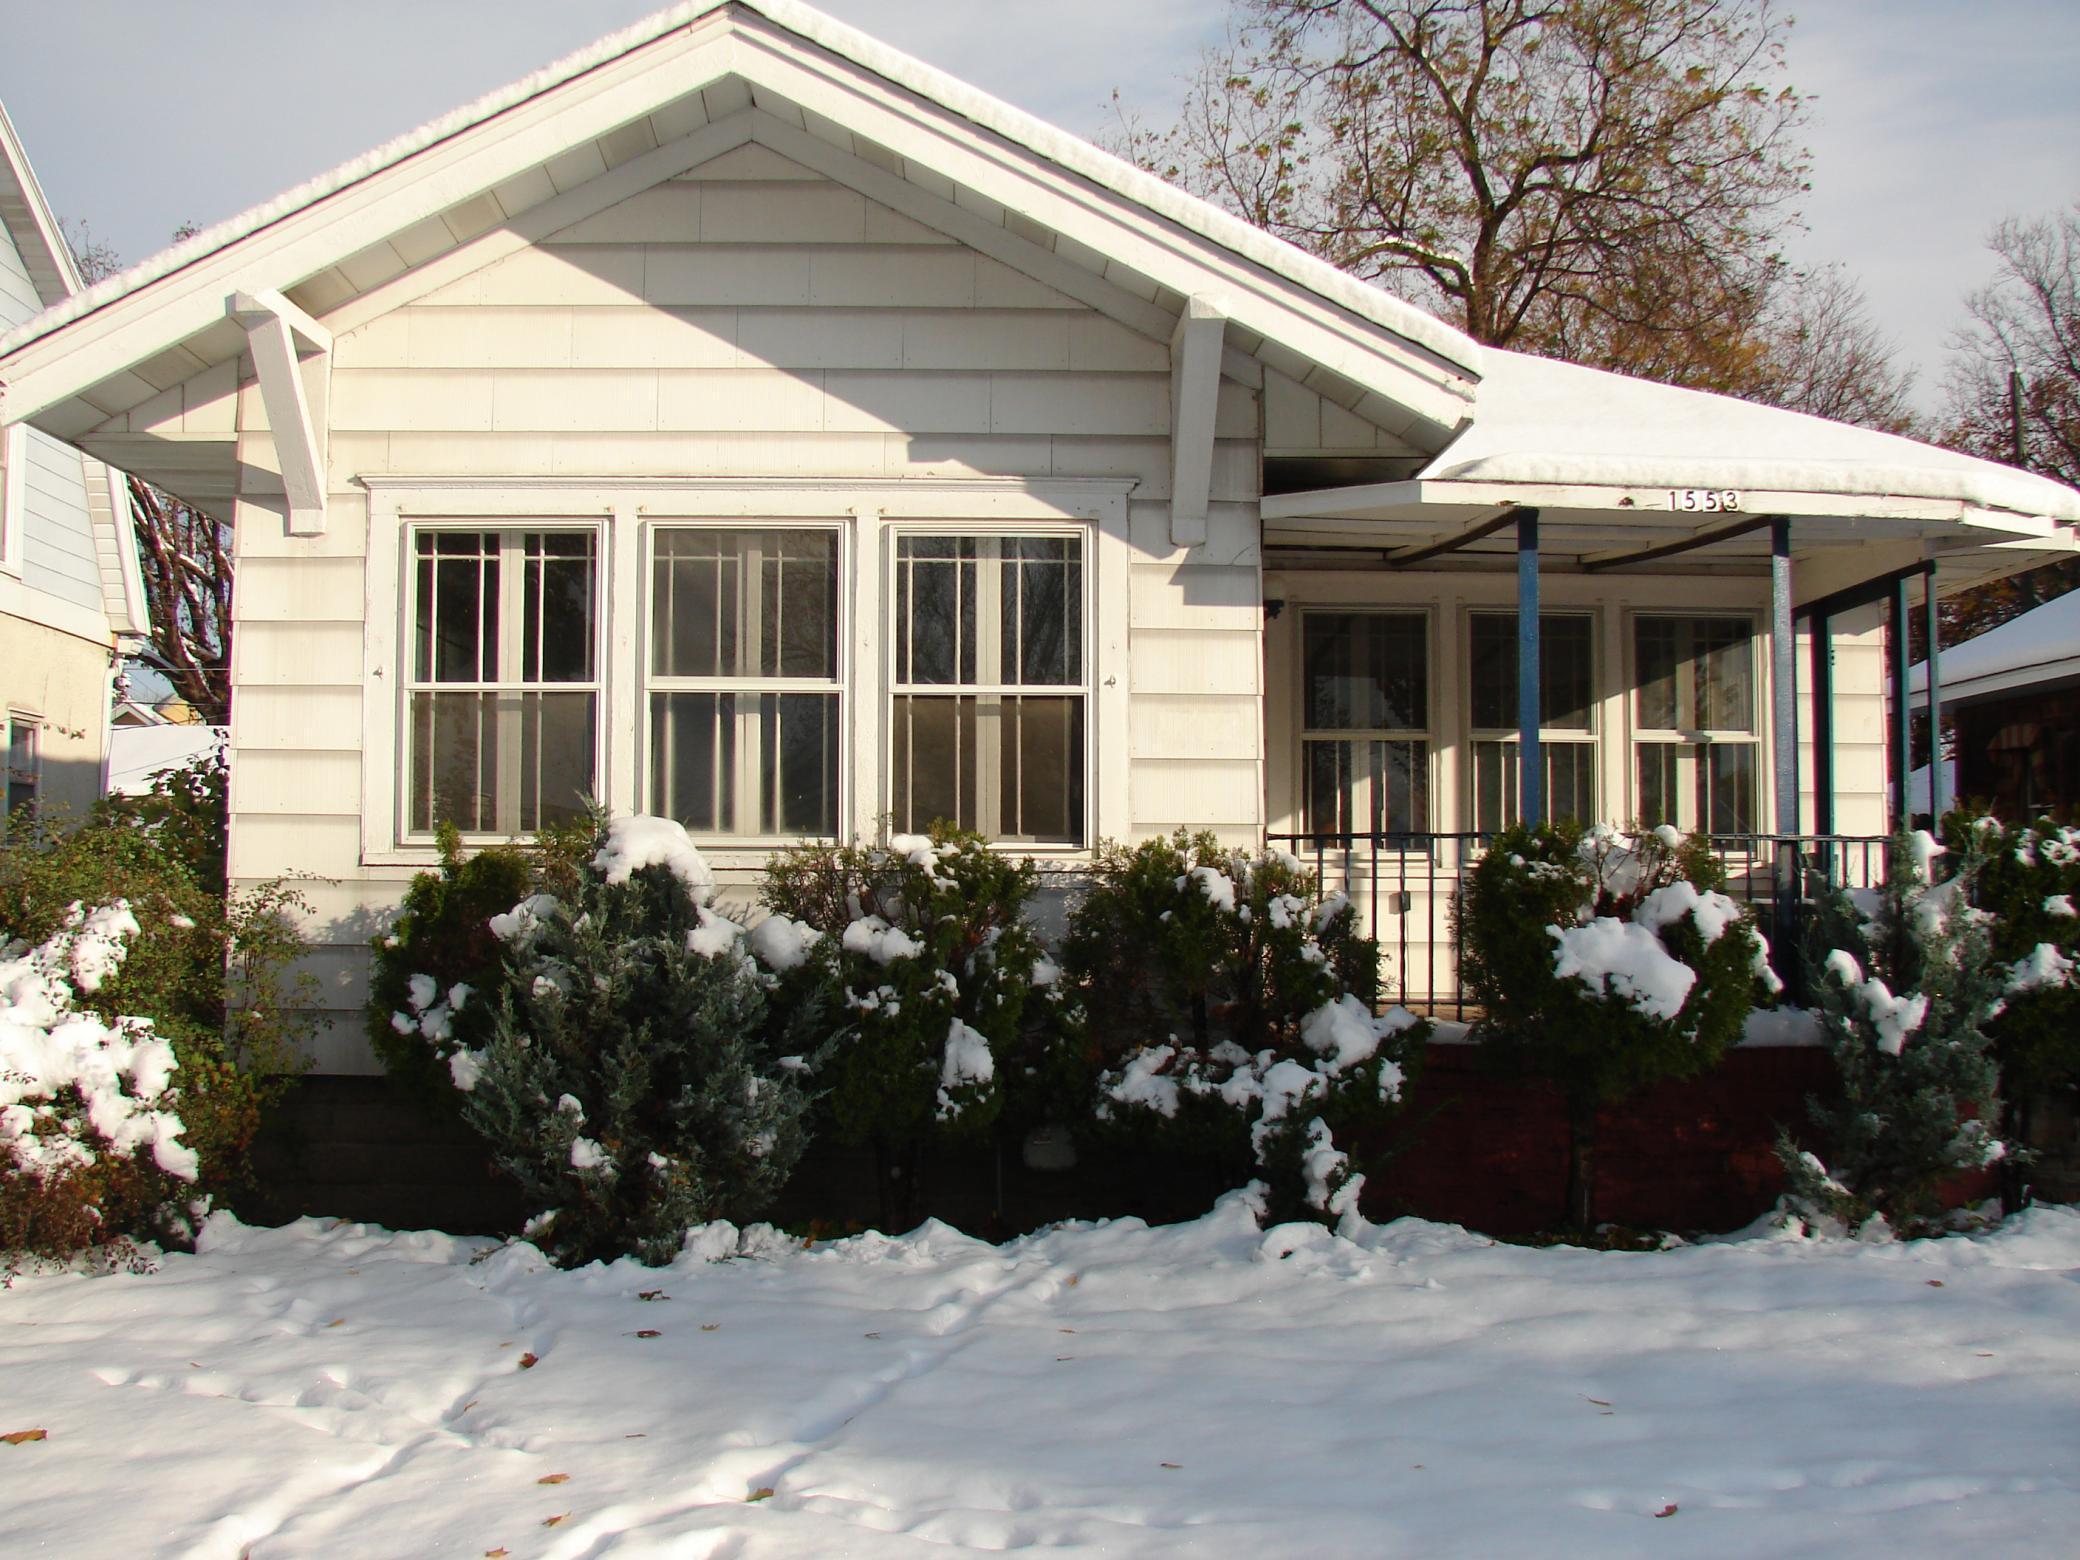 1553 Albany Avenue Property Photo - Saint Paul, MN real estate listing